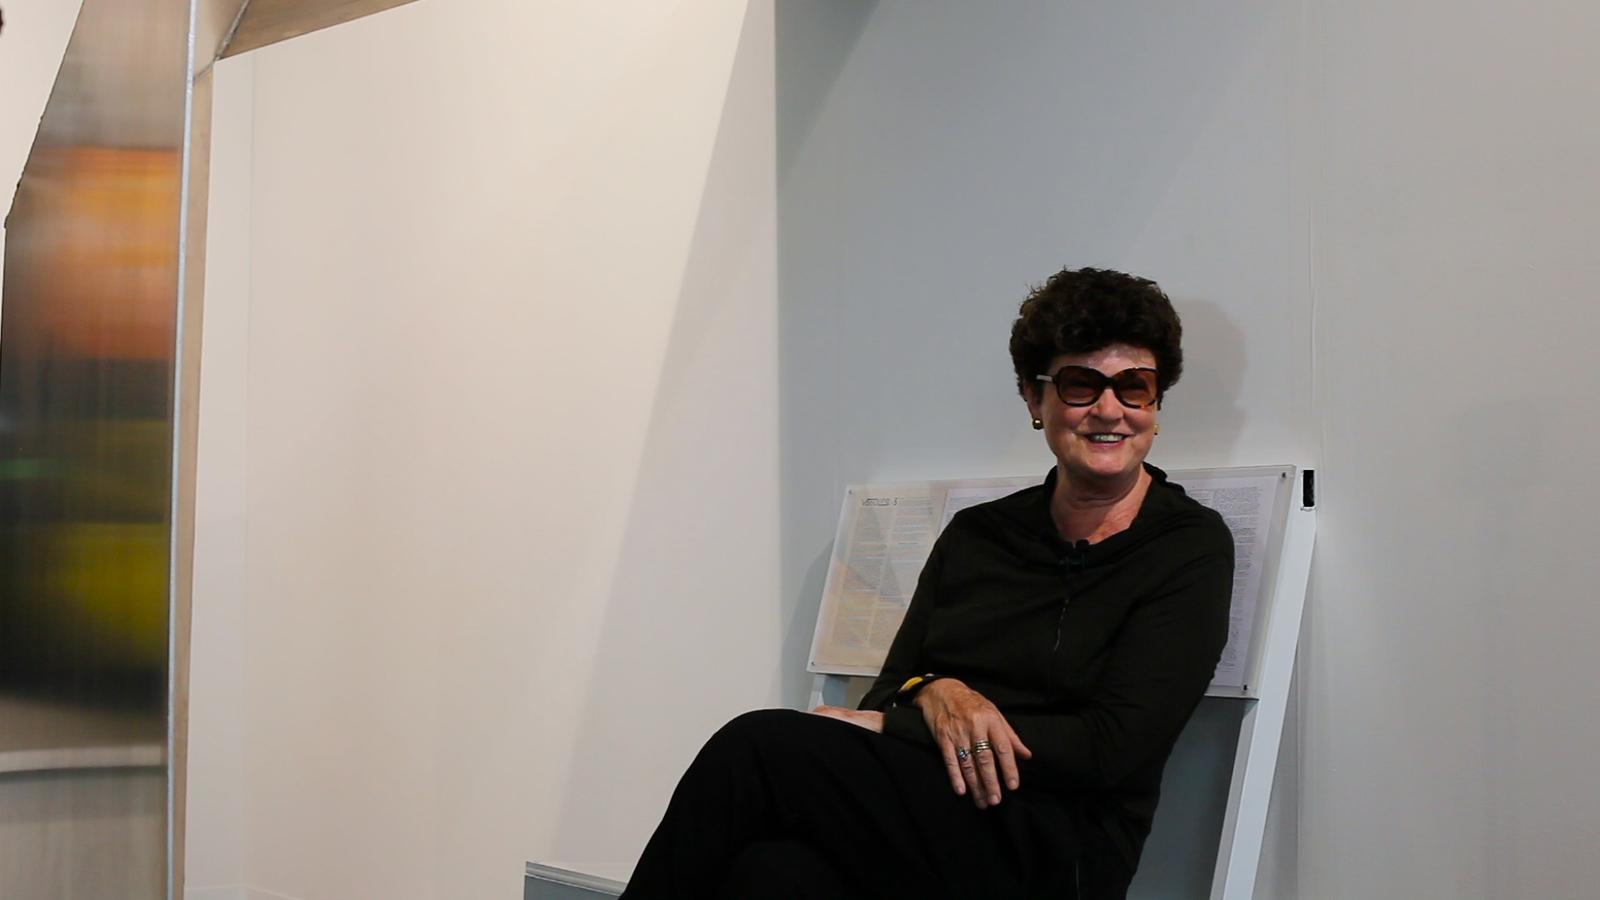 Chantal Crousel